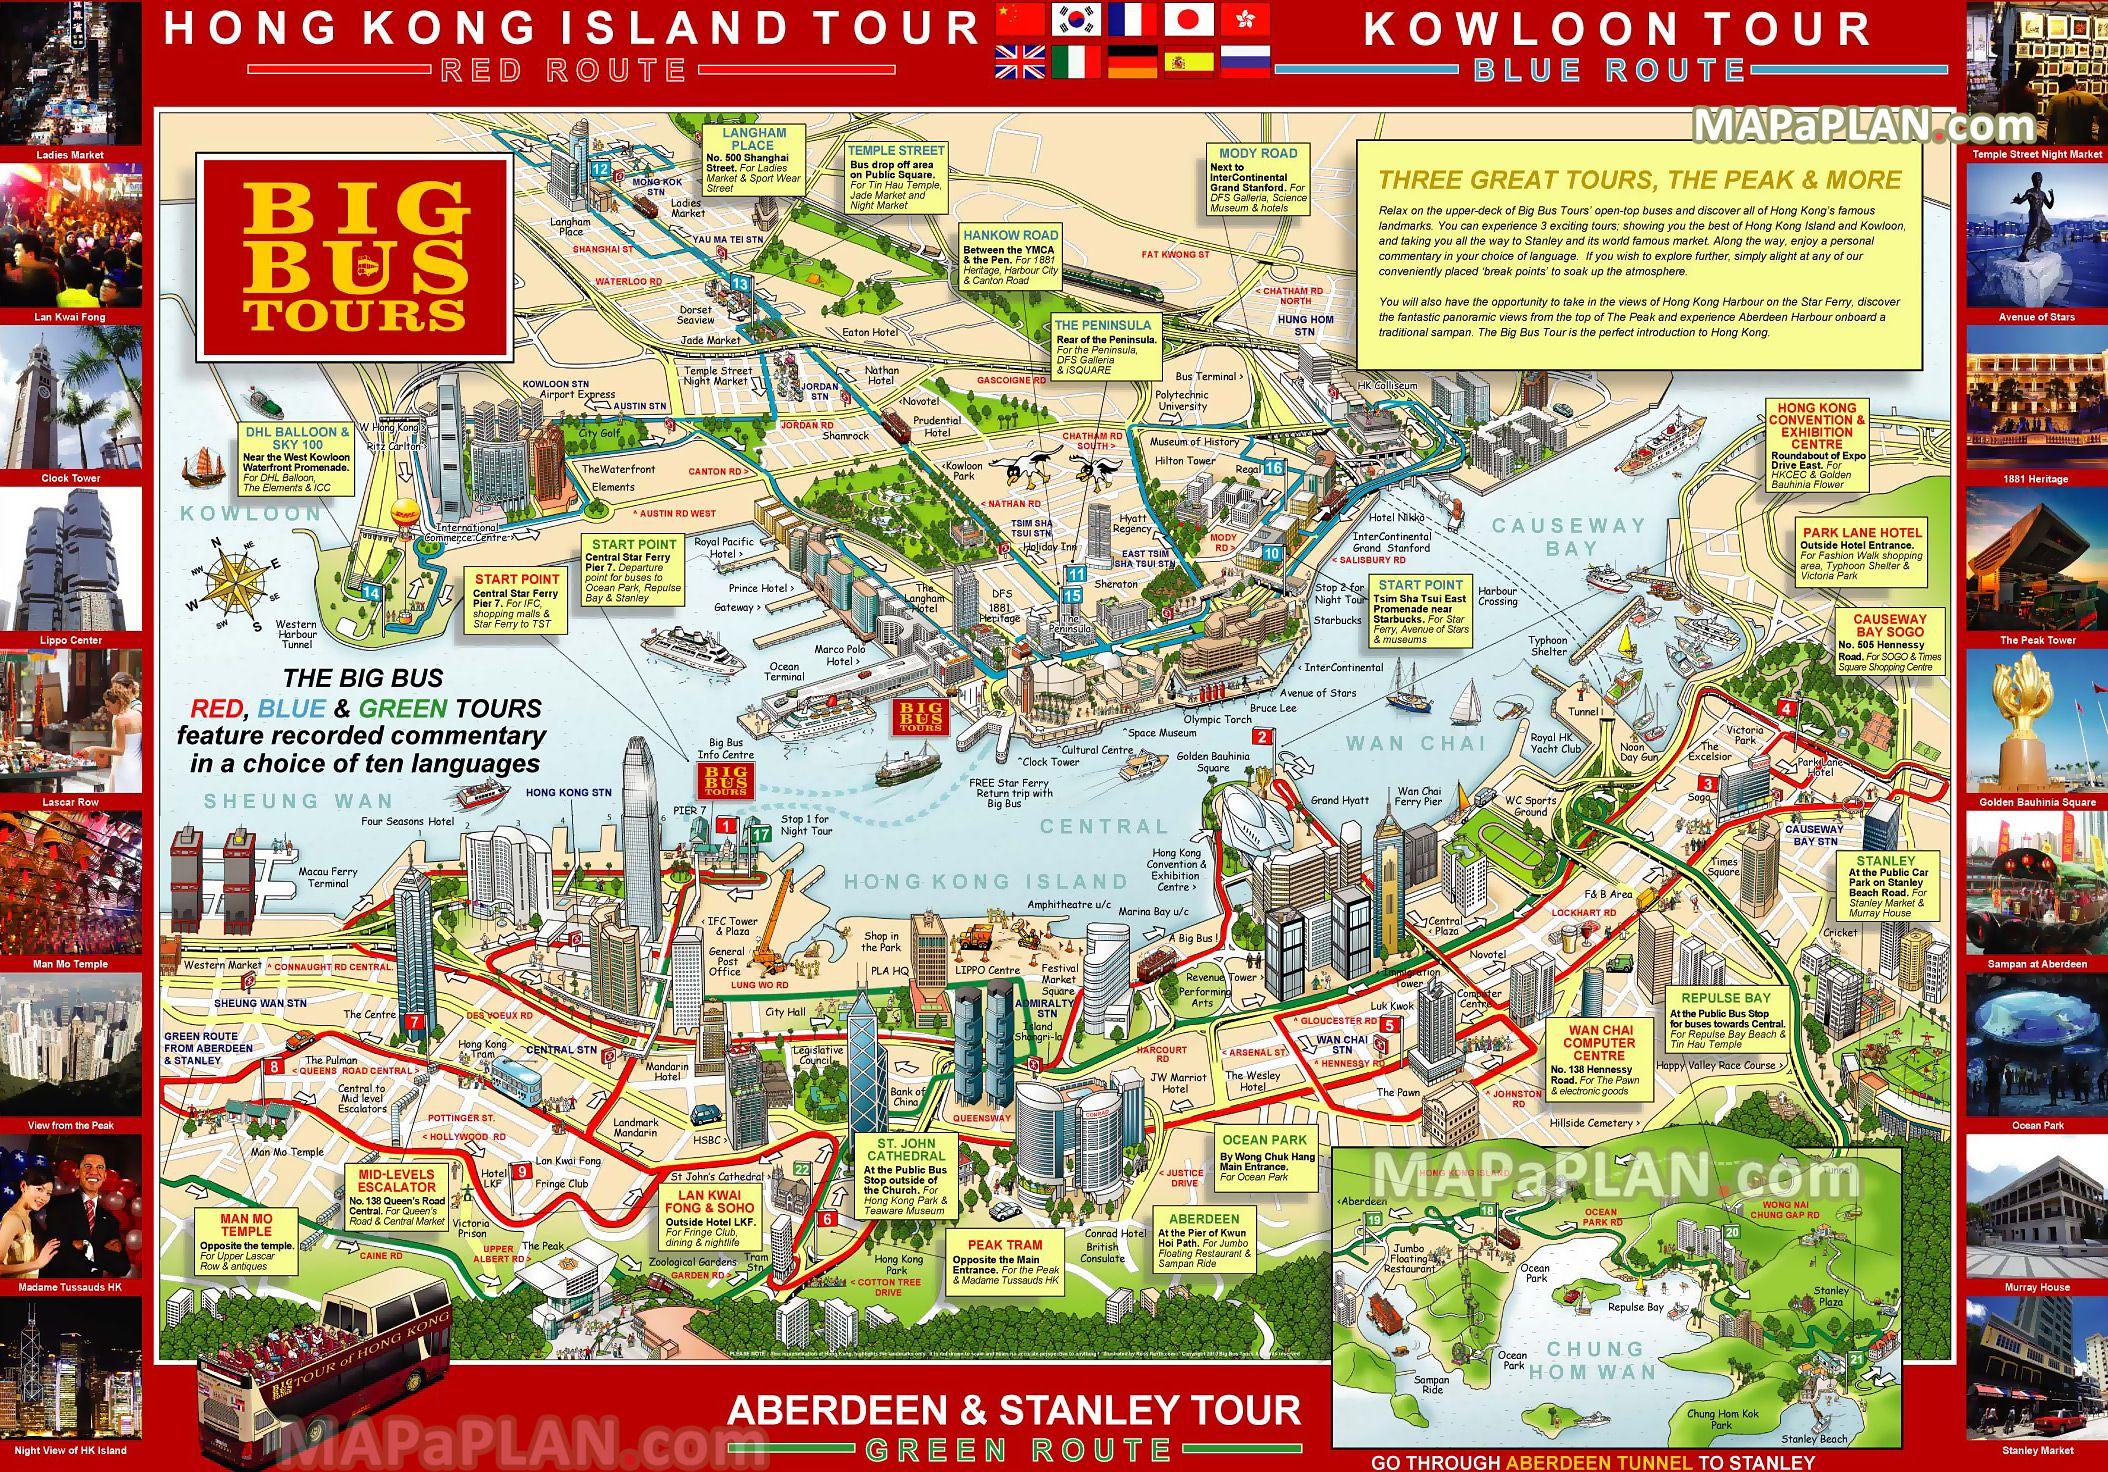 big bus city sightseeing hop on hop off double decker open top coach Kowloon Bus Route Map on kowloon tong, manila bus route map, airport express, philadelphia bus route map, chai wan, frankfurt bus route map, rome bus route map, island line, stockholm bus route map, new york city bus route map, sham shui po, canada bus route map, orlando bus route map, causeway bay, mong kok, luxembourg bus route map, north point, athens bus route map, tsim sha tsui, lima bus route map, tsing yi, tsuen wan, jinan bus route map, sheung wan, wellington bus route map, abu dhabi bus route map, hong kong station, xian bus route map, tseung kwan o, singapore bus route map, zhuhai bus route map, osaka bus route map, qingdao bus route map, yau ma tei, guangzhou bus route map,